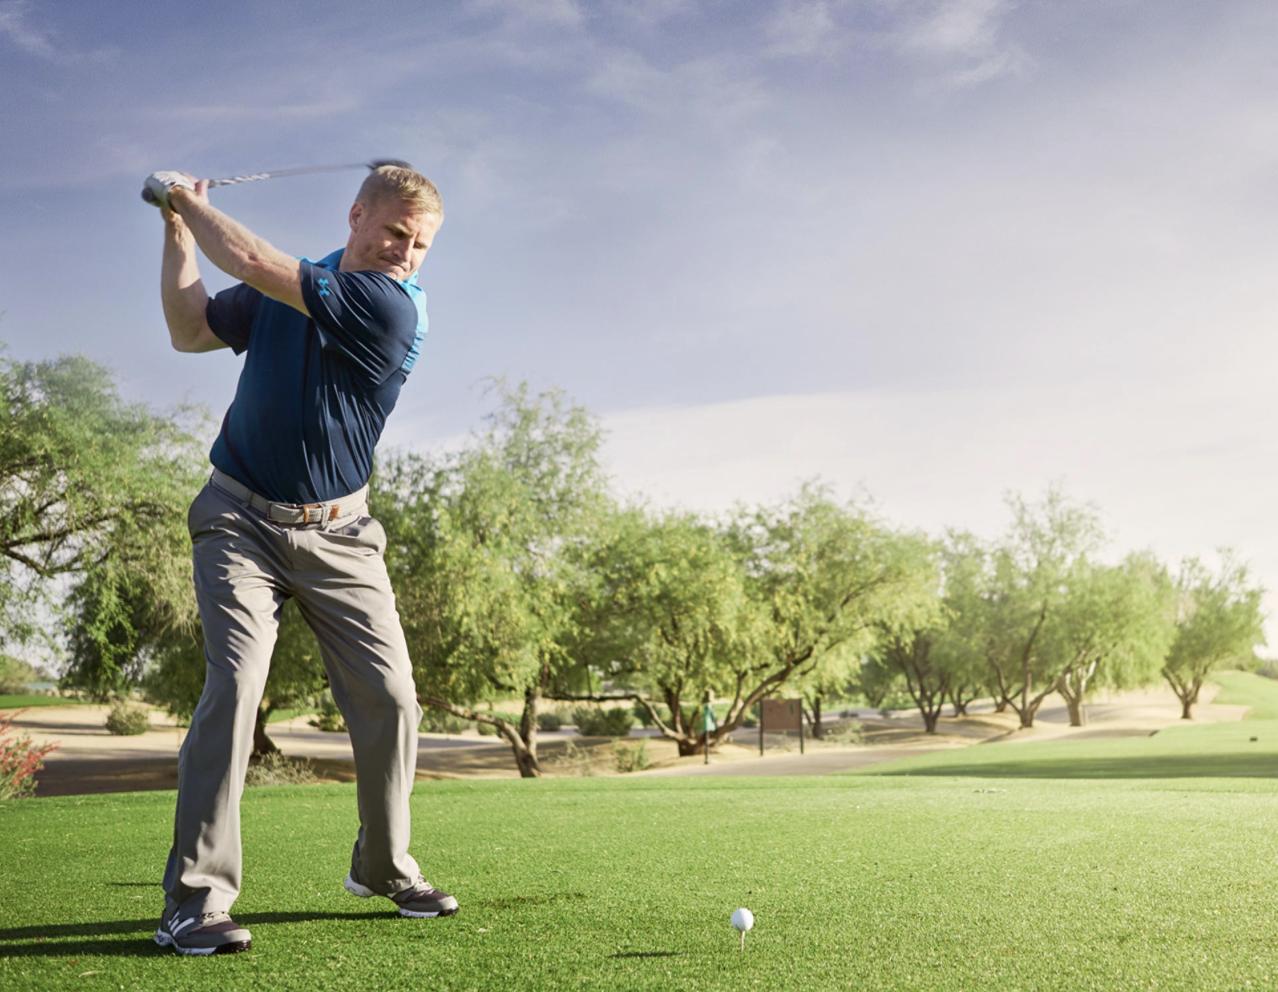 A man tees up to hit a golf ball